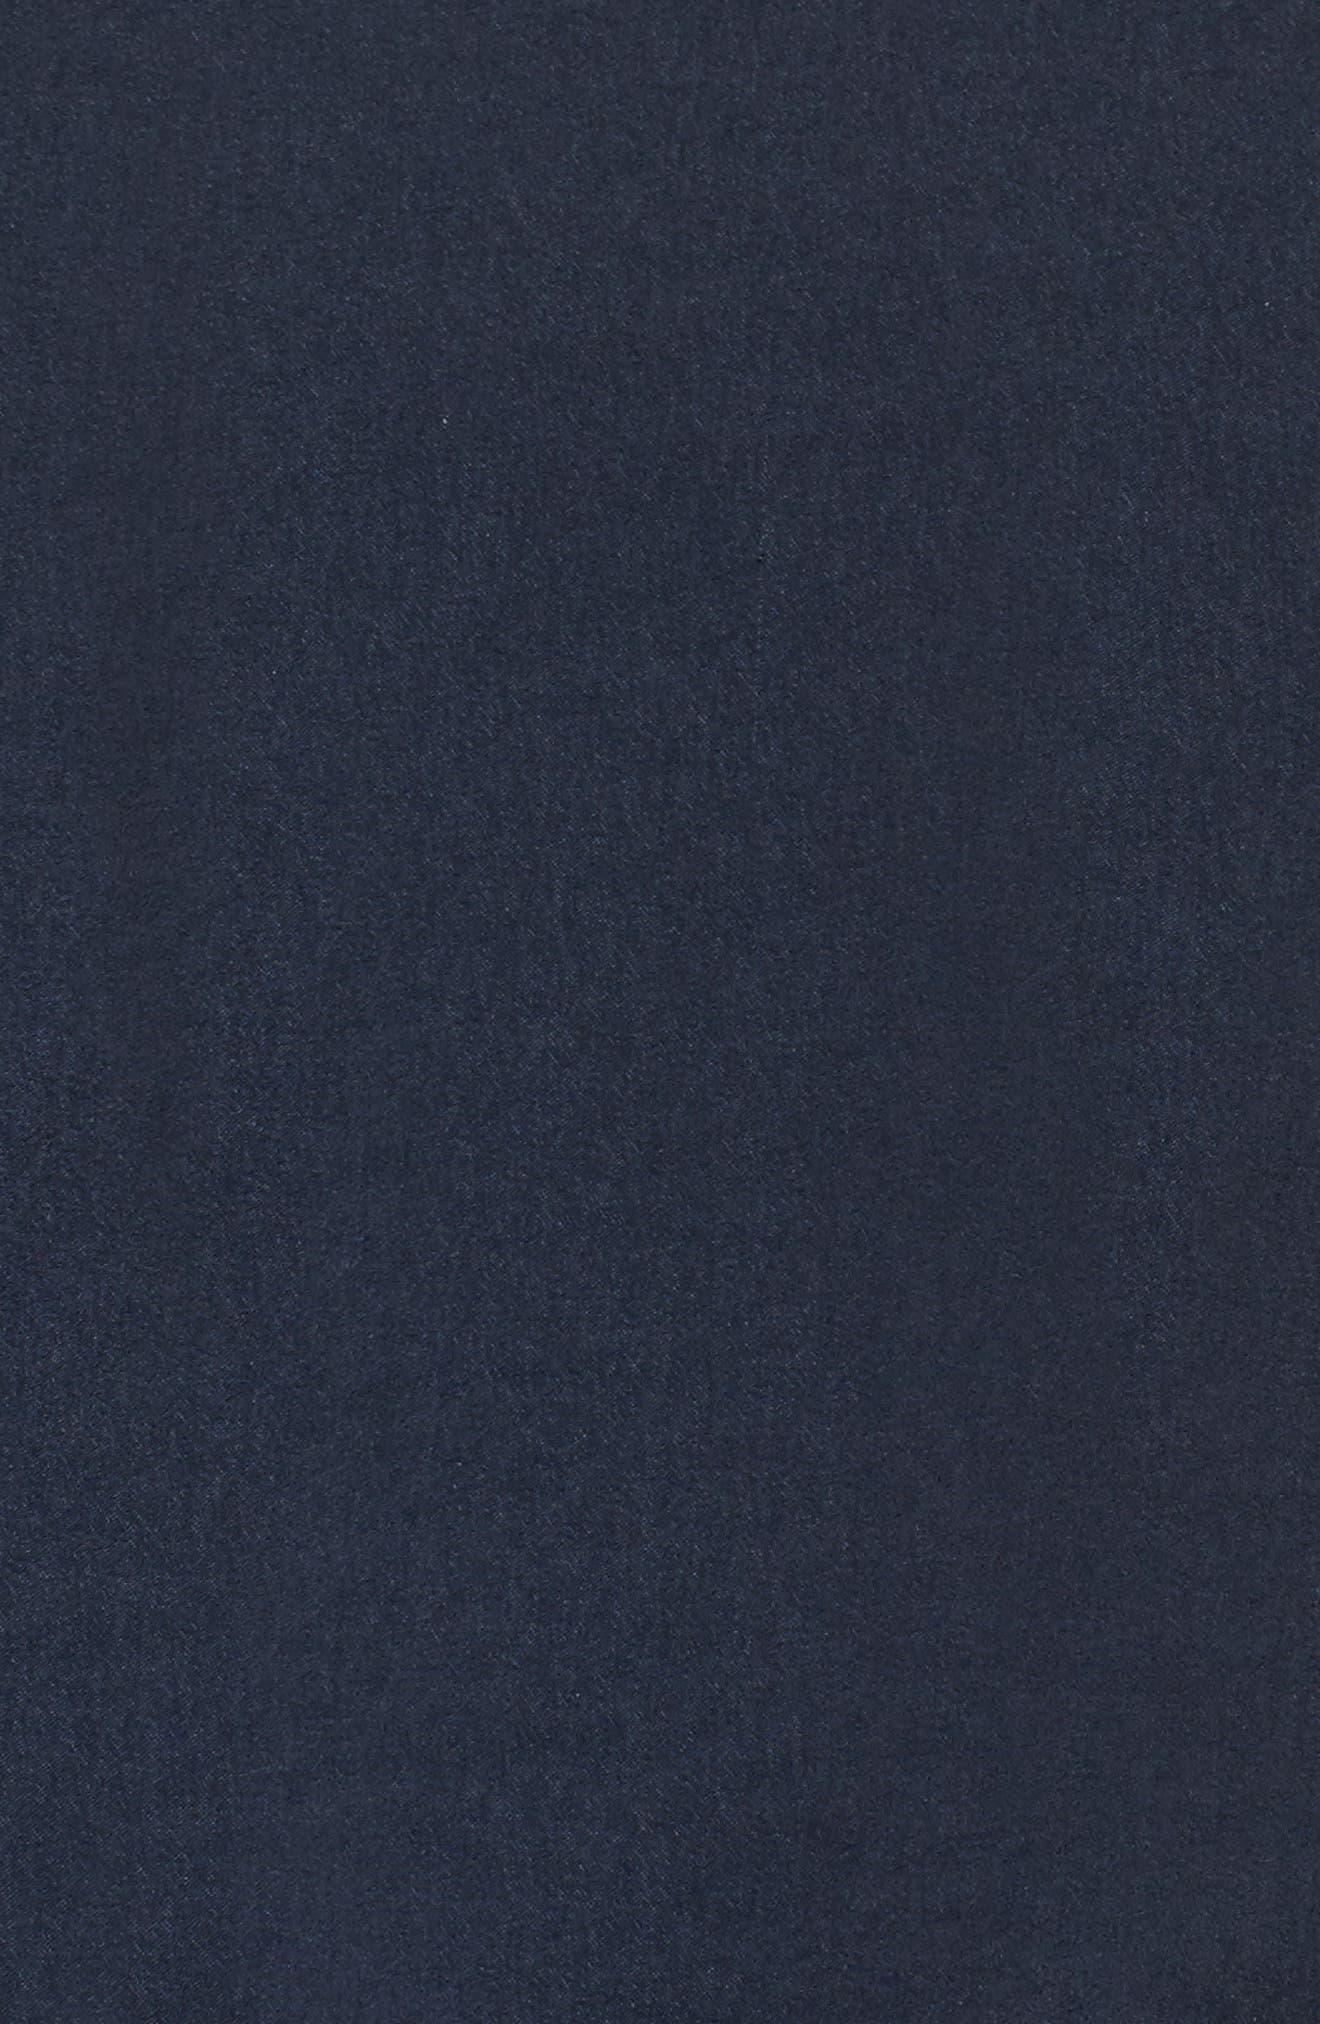 Juliette Cold Shoulder Ruffle Top,                             Alternate thumbnail 6, color,                             Navy